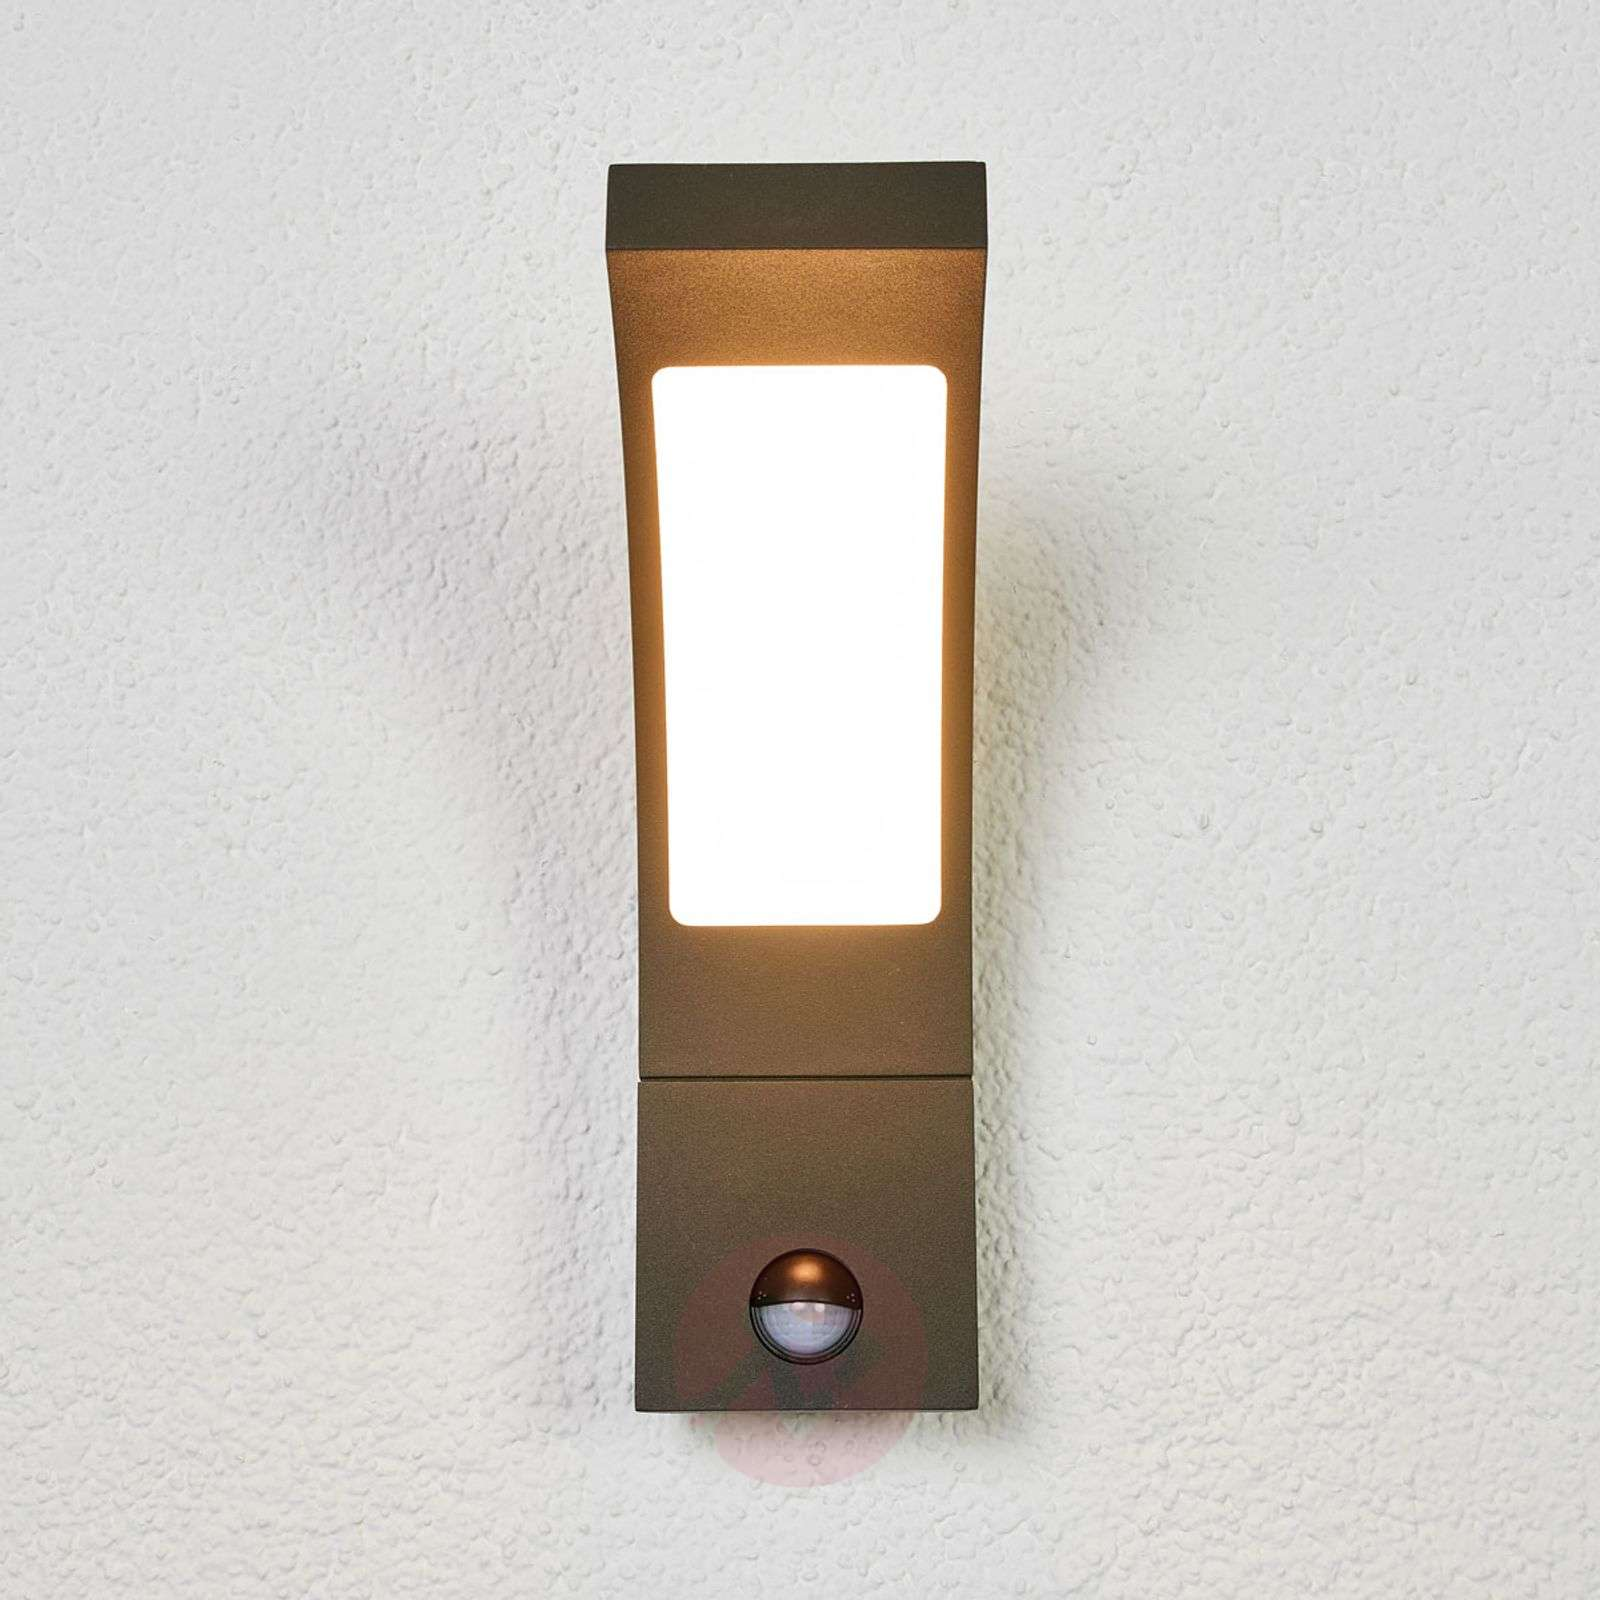 Juvia sensor outdoor wall light with LEDs-9619127-09